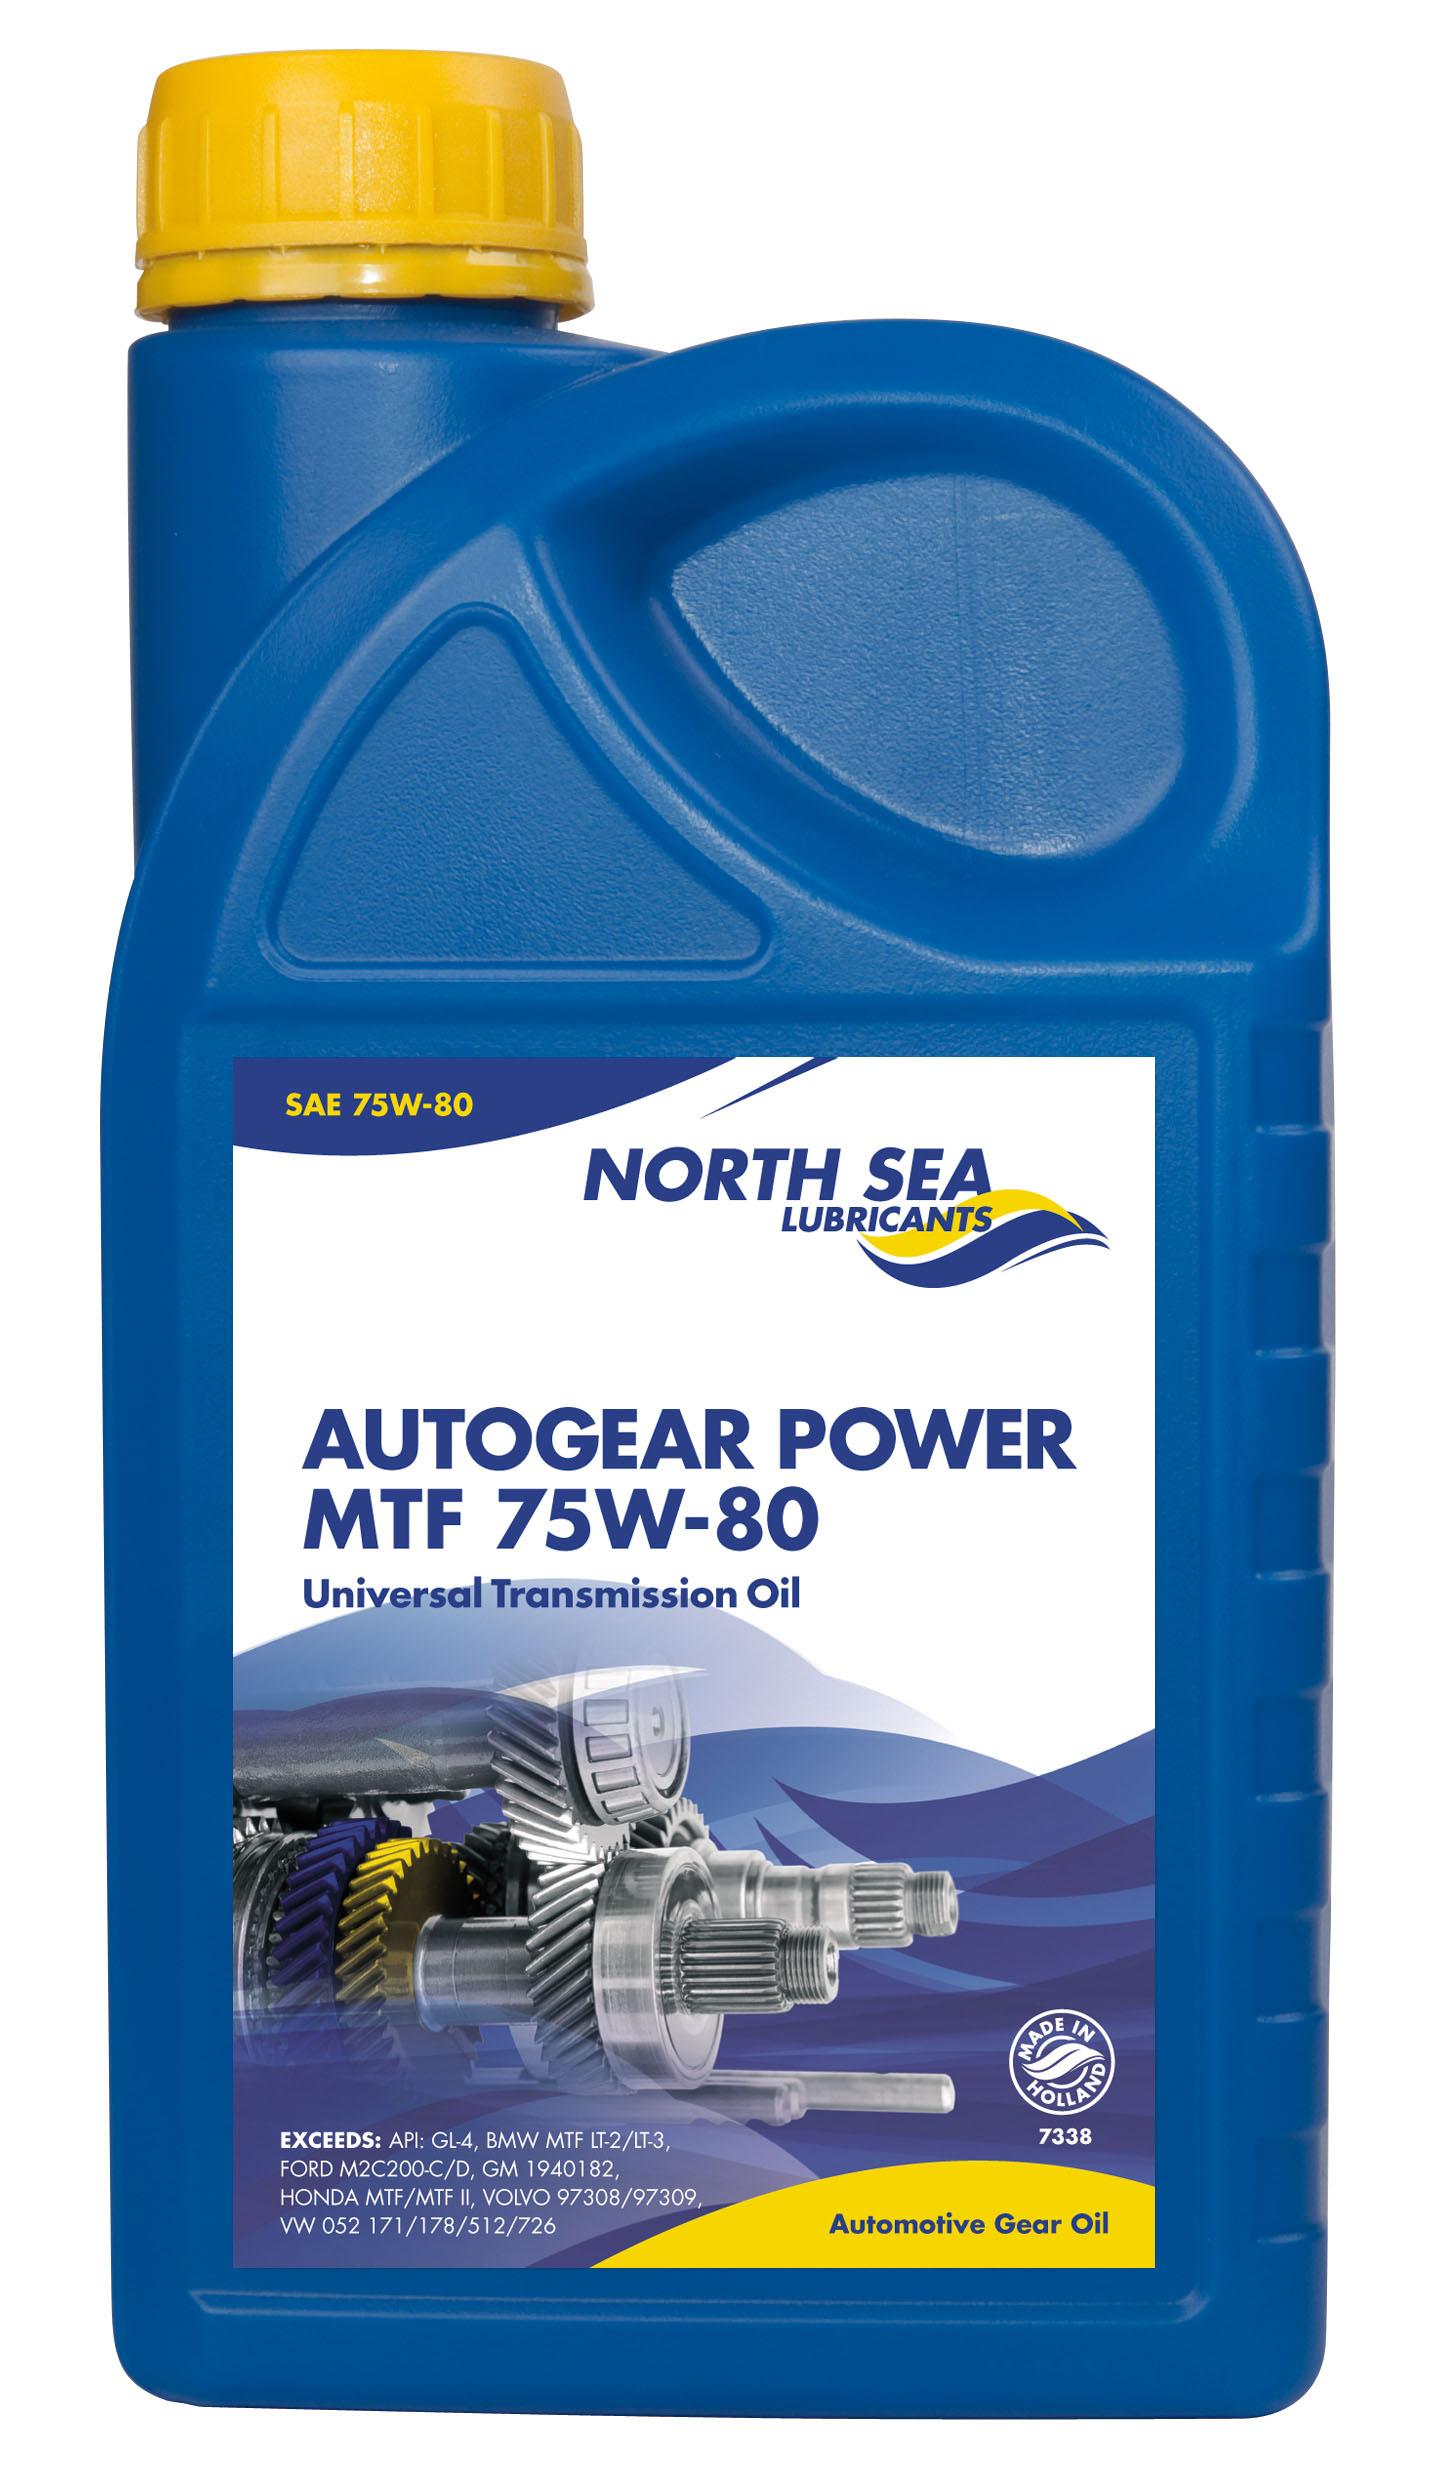 Autogear Power Mtf 75w 80 North Sea Lubricants